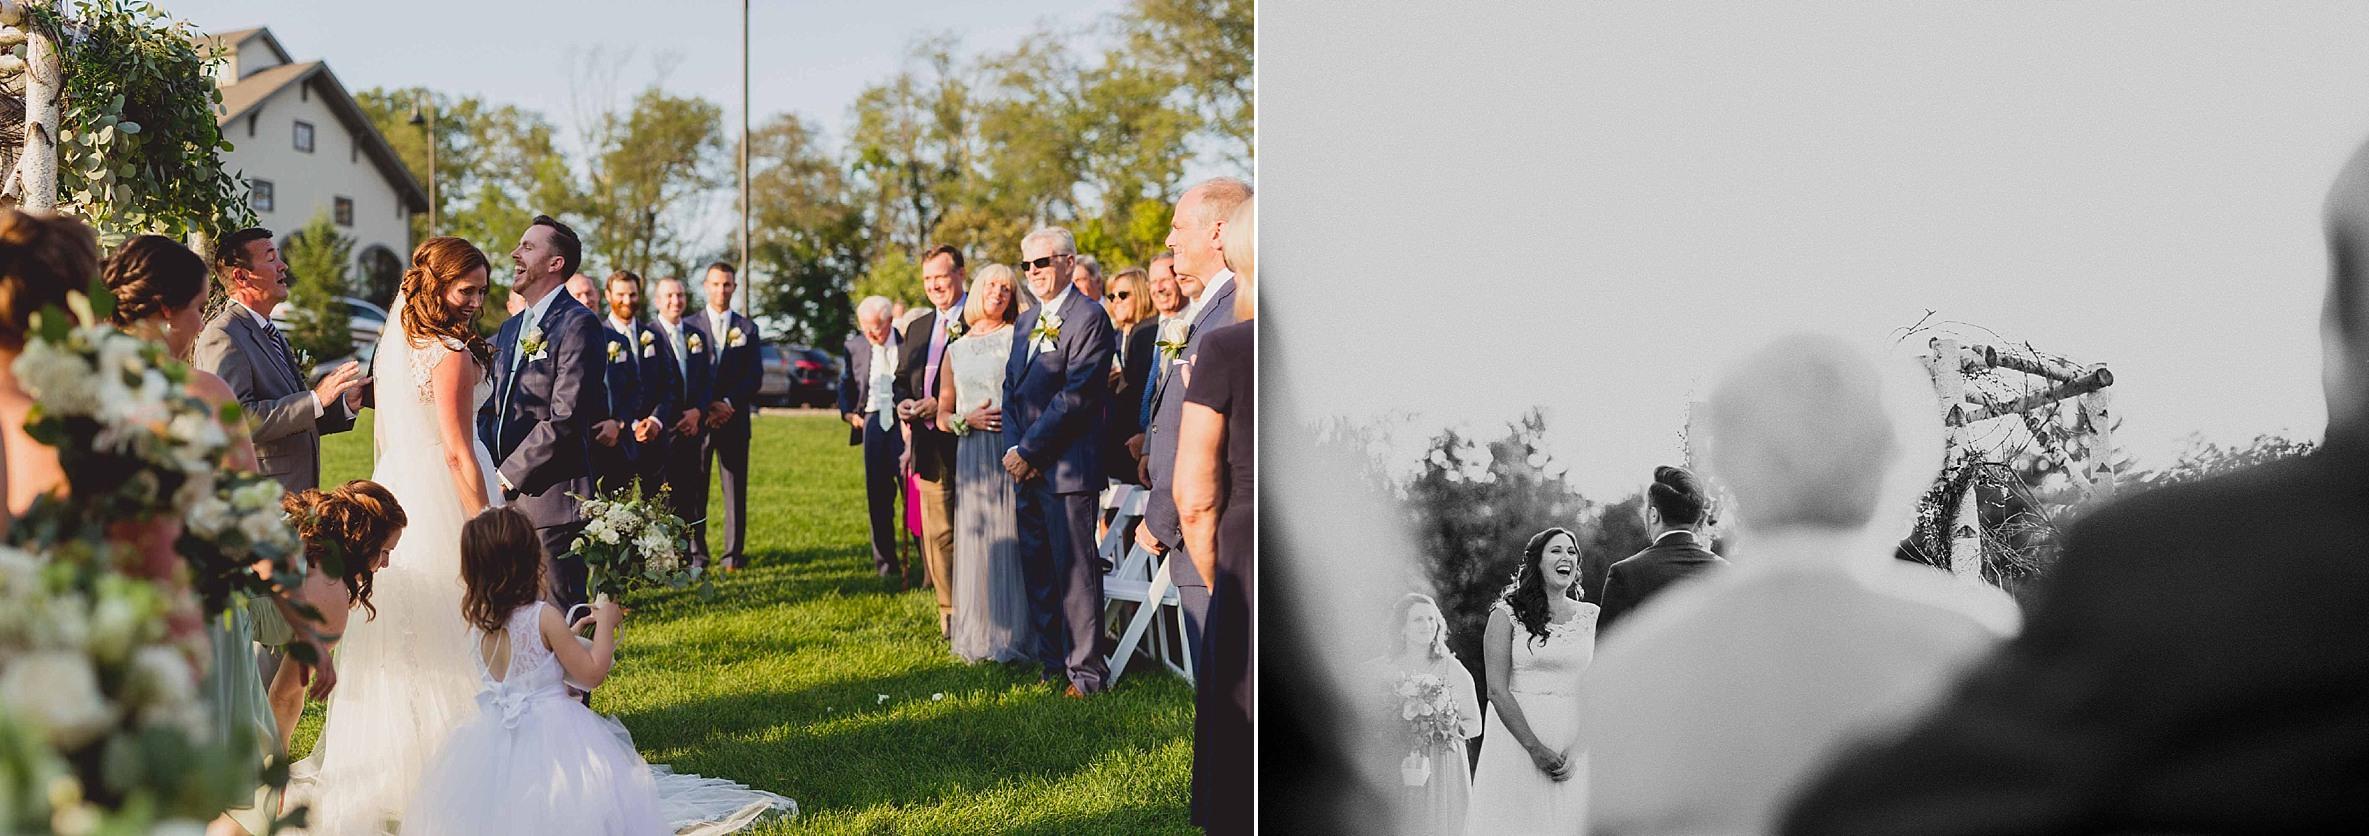 labelle winery wedding-48.jpg